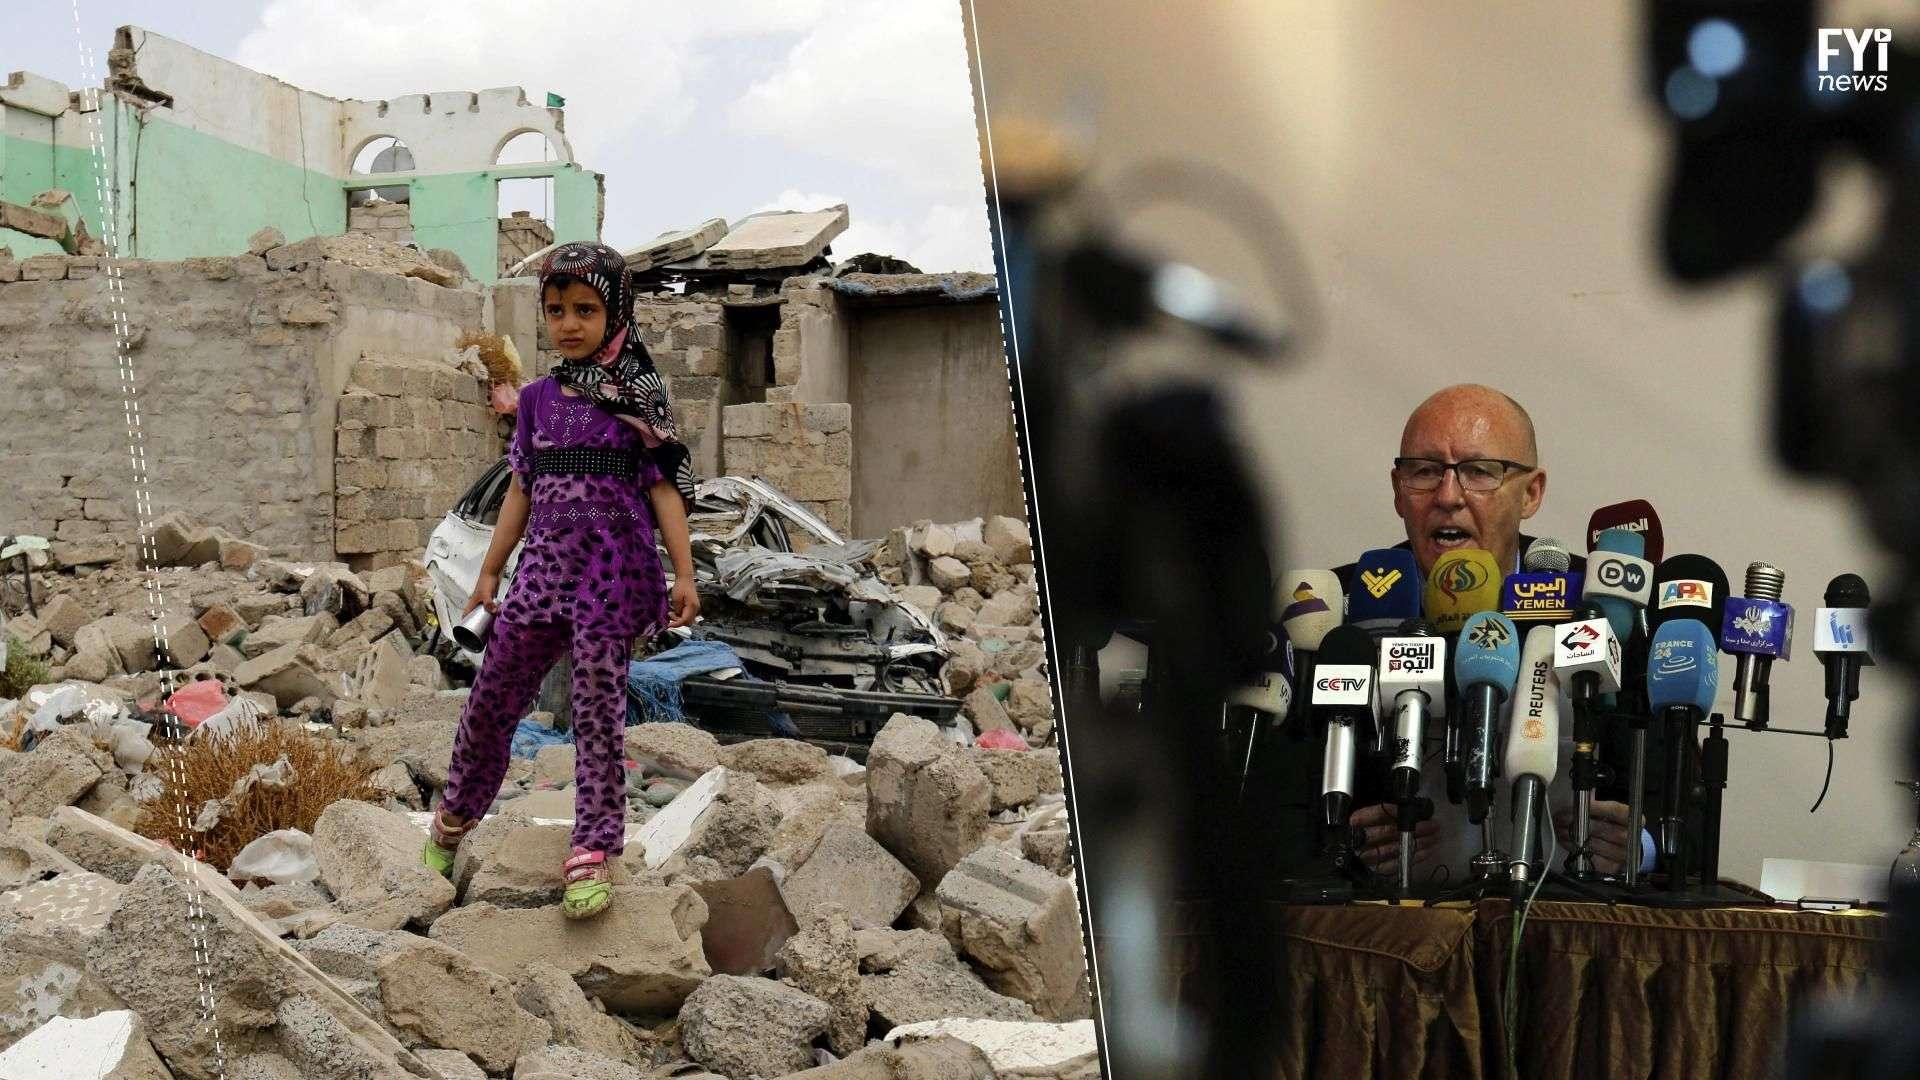 La hambruna se acerca a Yemen